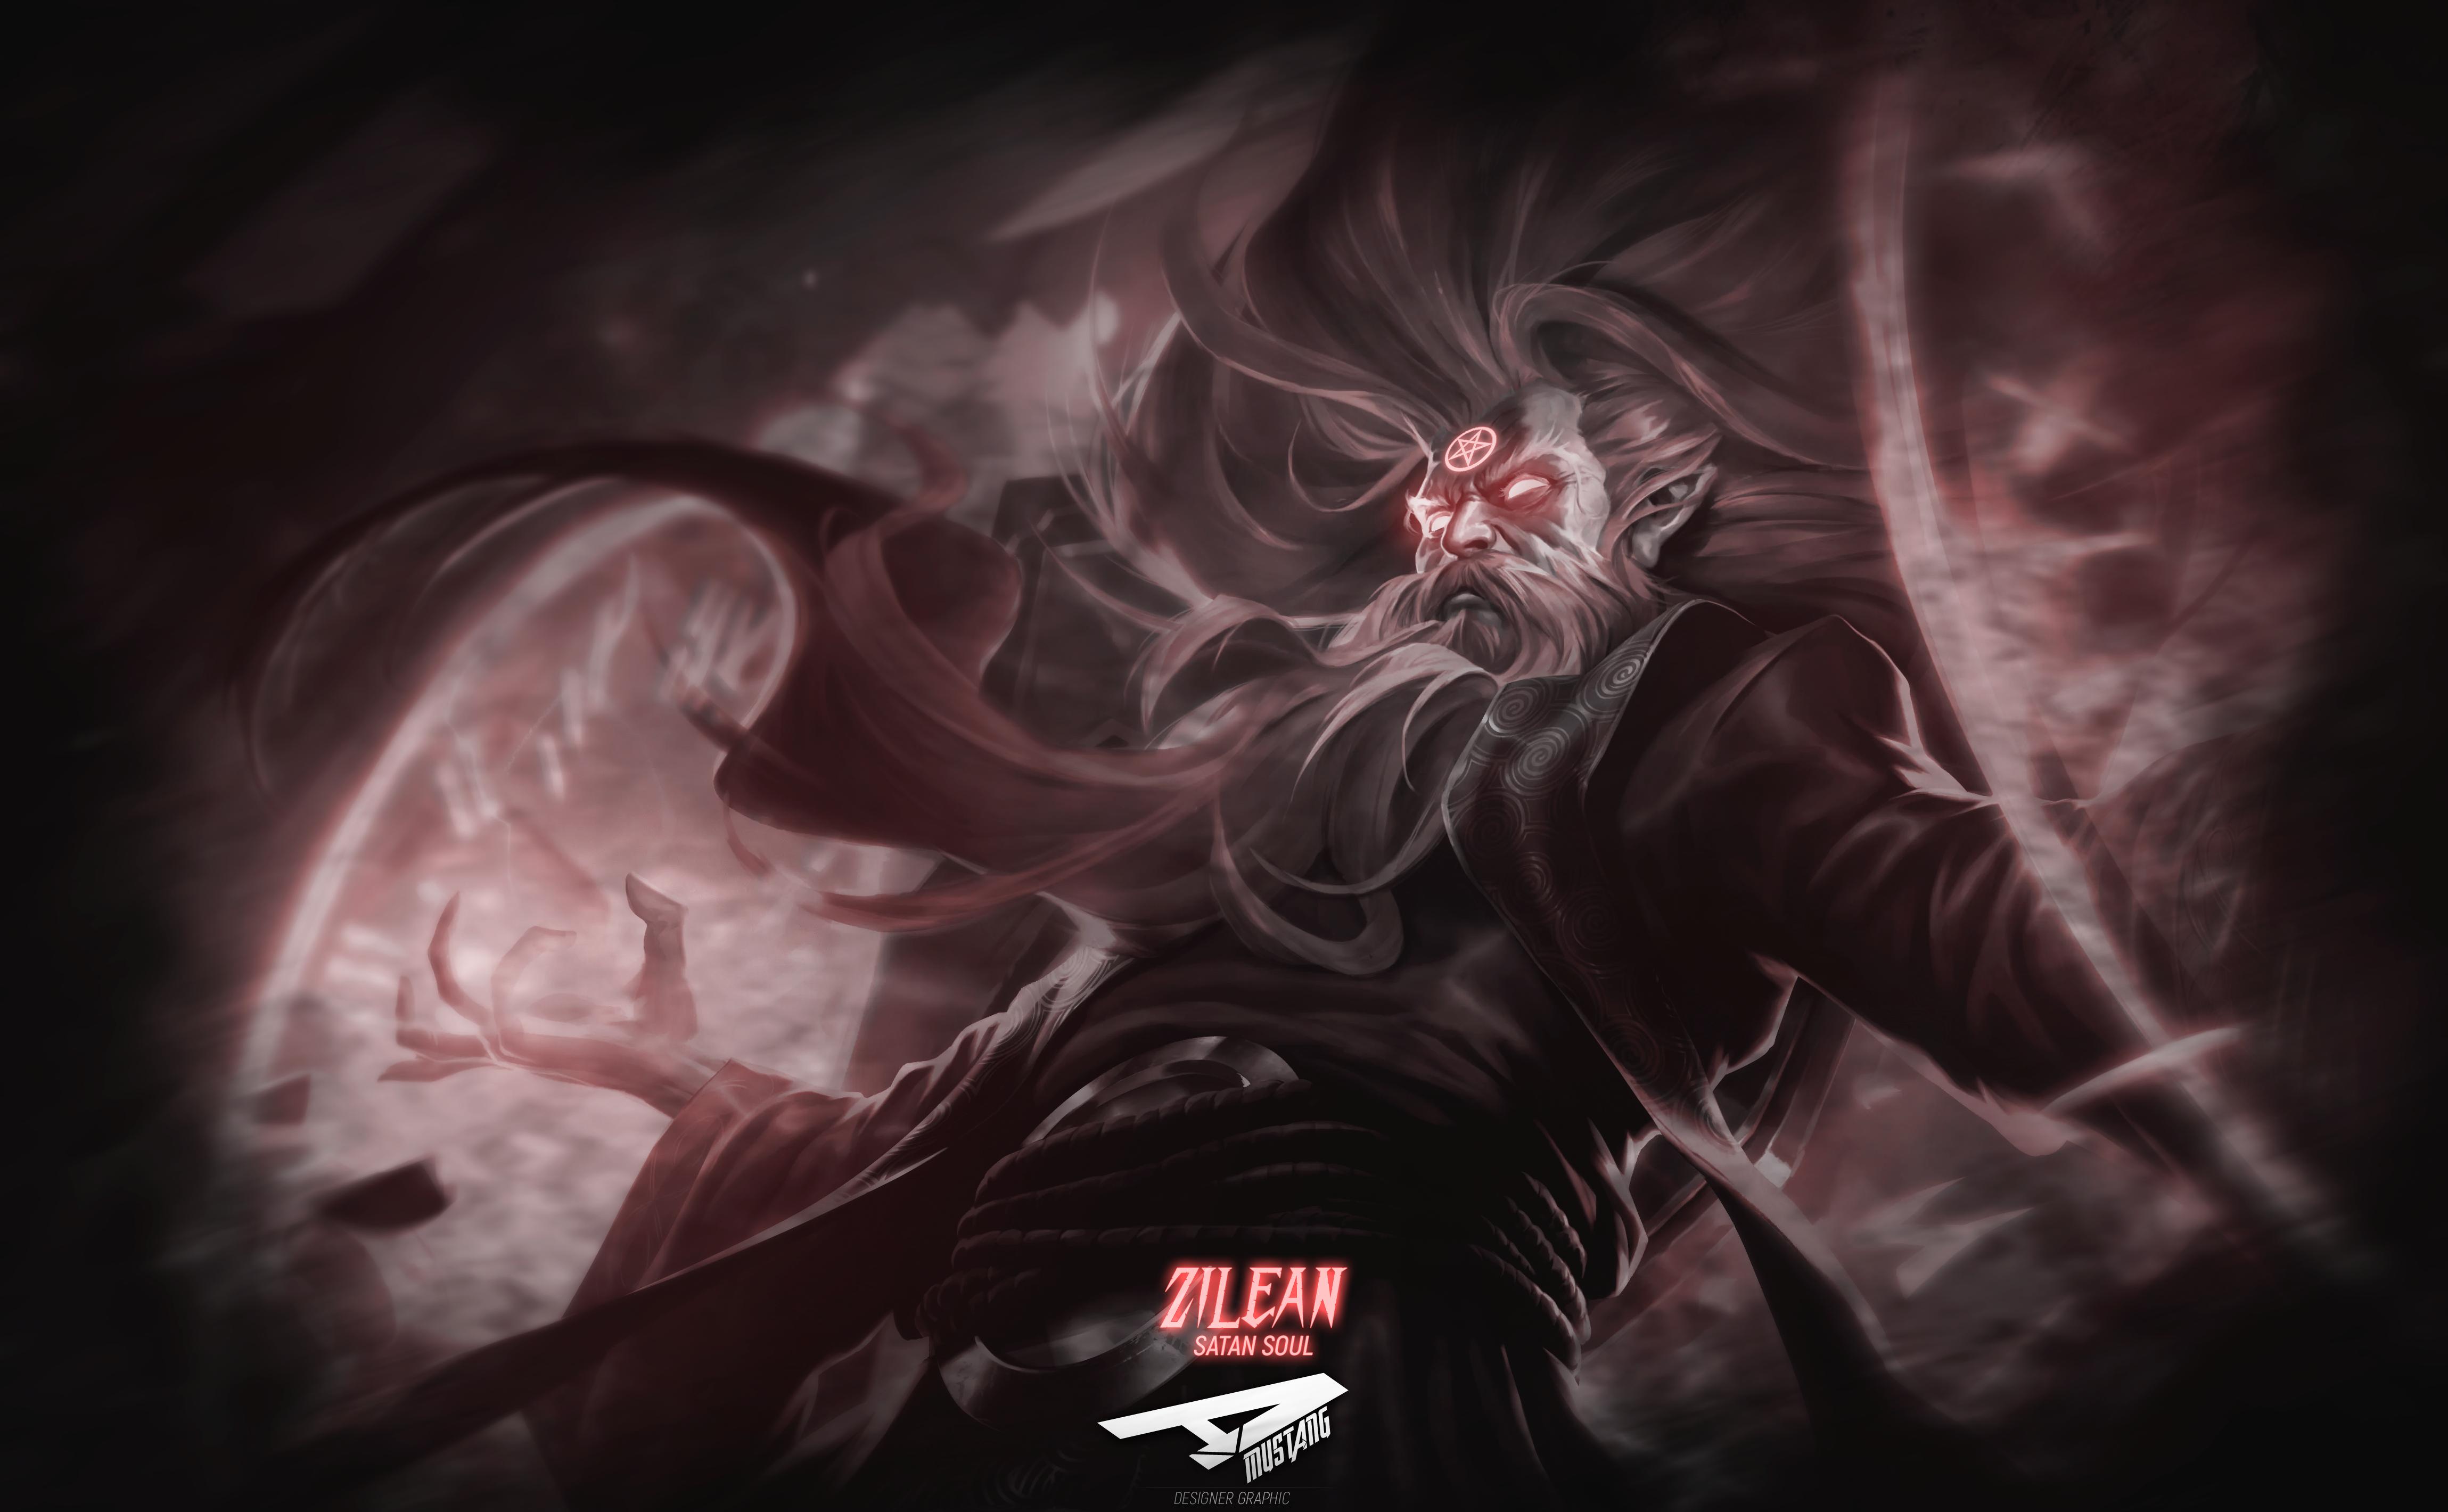 Zilean   Satan Soul by AlexMust4ng